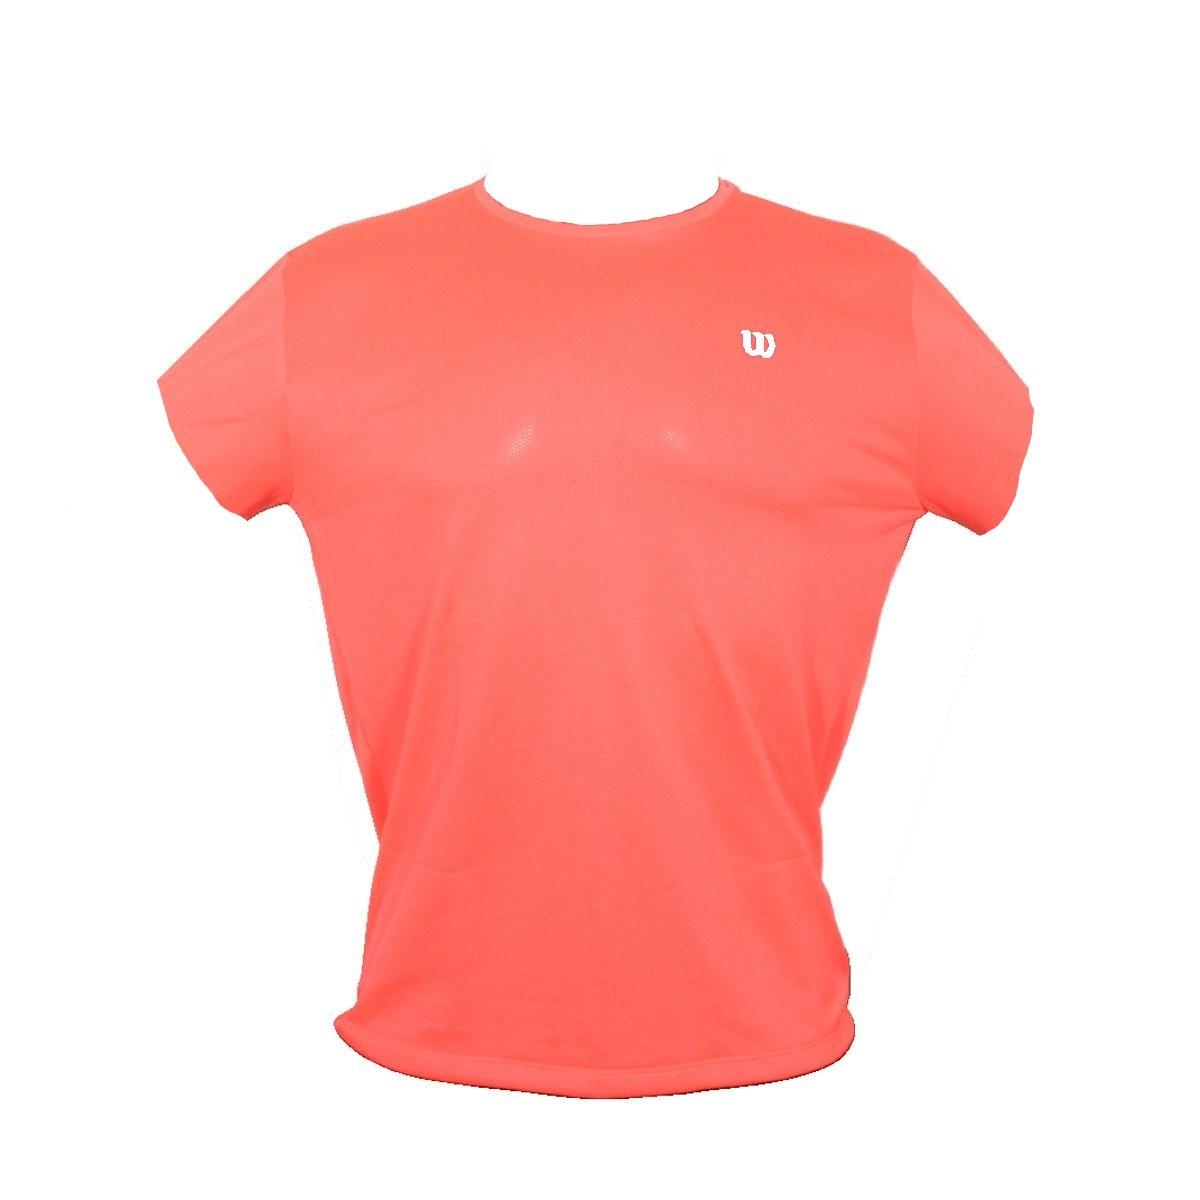 Camiseta Wilson Trainning 10 Neon Coral e Branco - Feminino